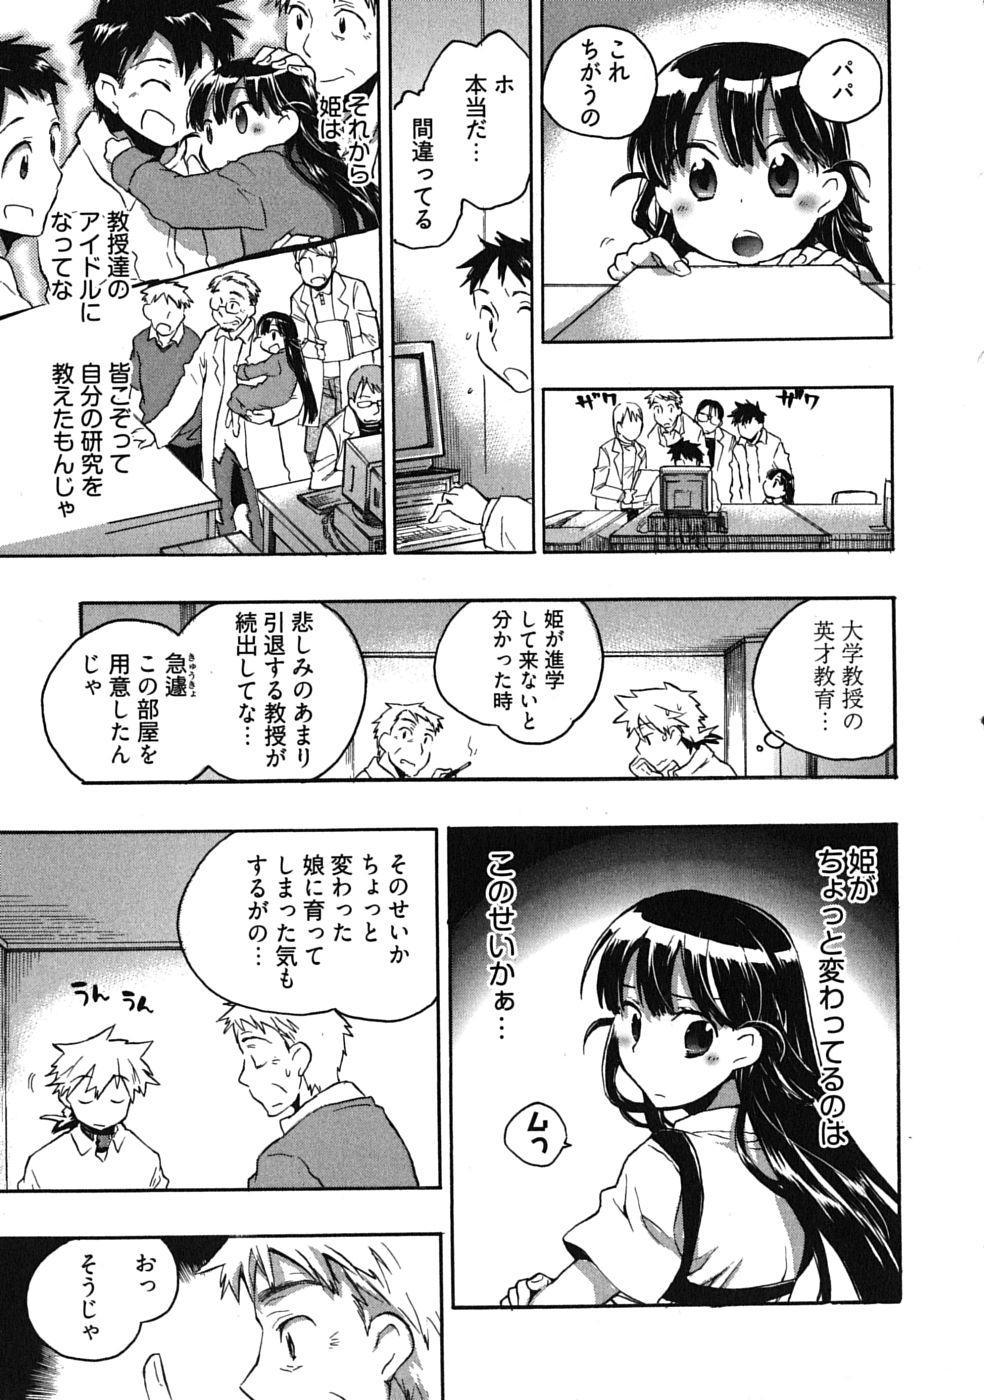 Omocha No Ohime-sama | La Princesse De Jouet Vol. 3 14